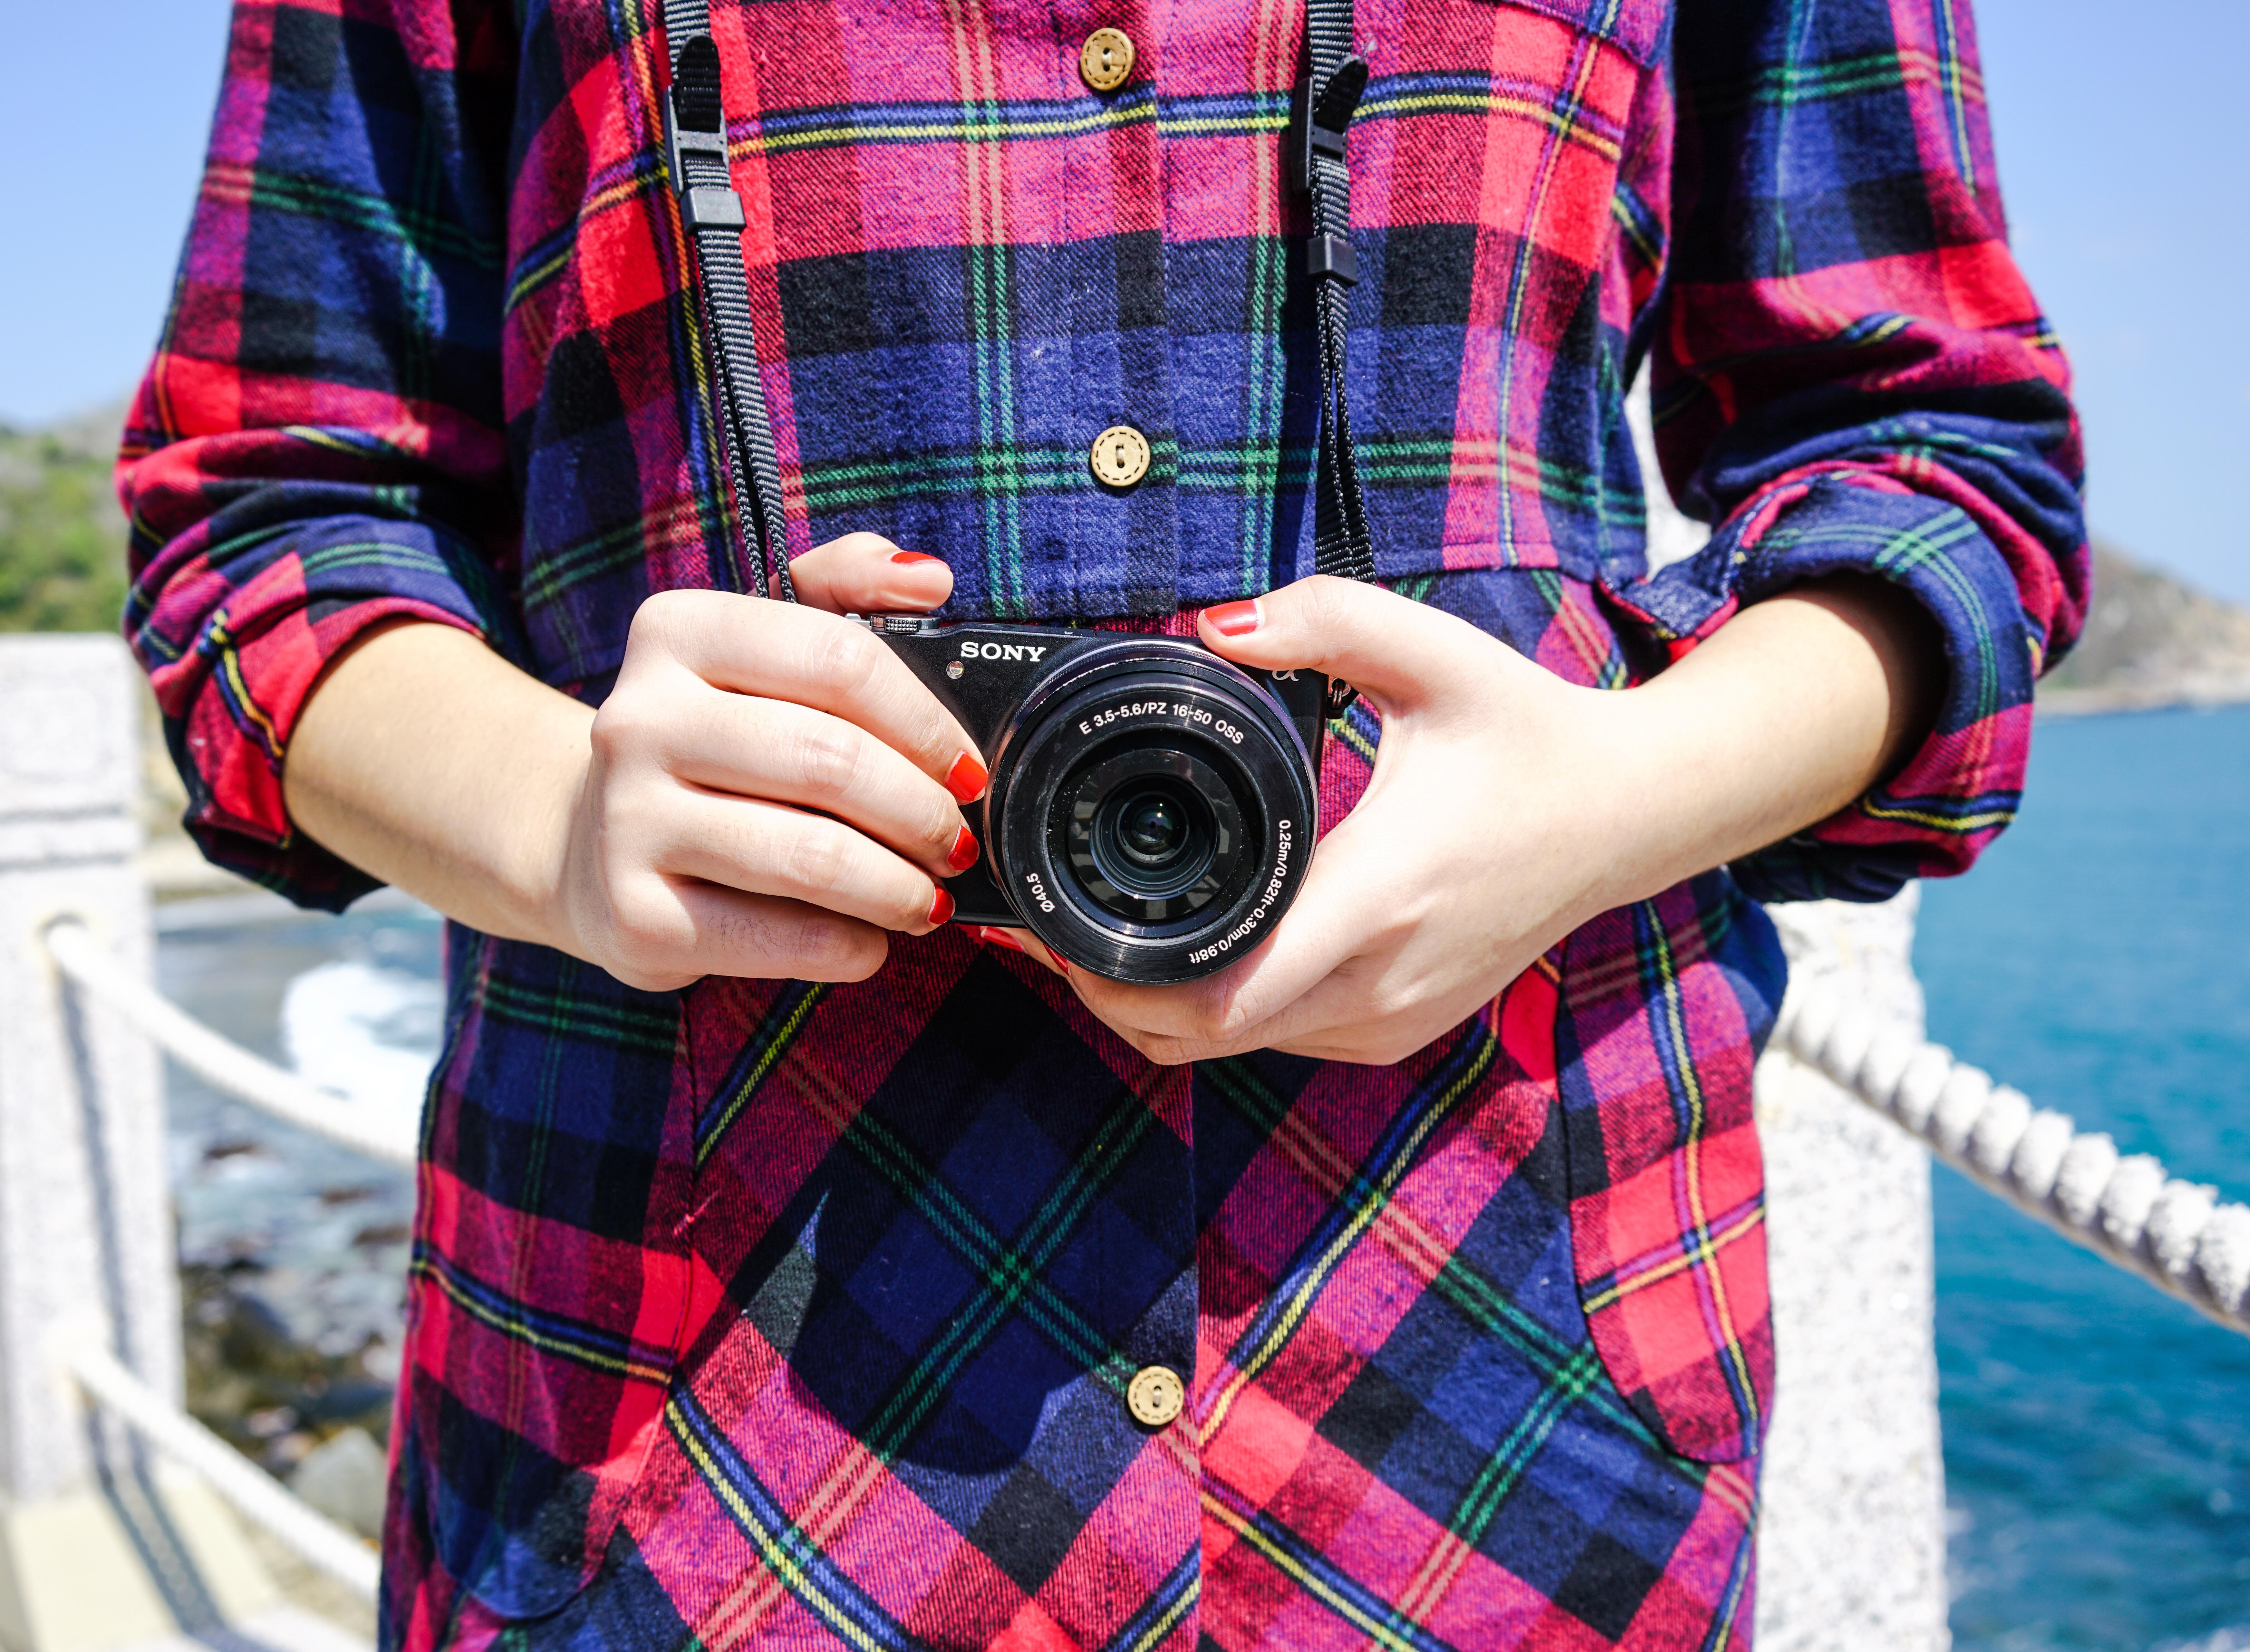 Fotos gratis : patrón, ropa, tartán, textil, diseño, falda escocesa ...